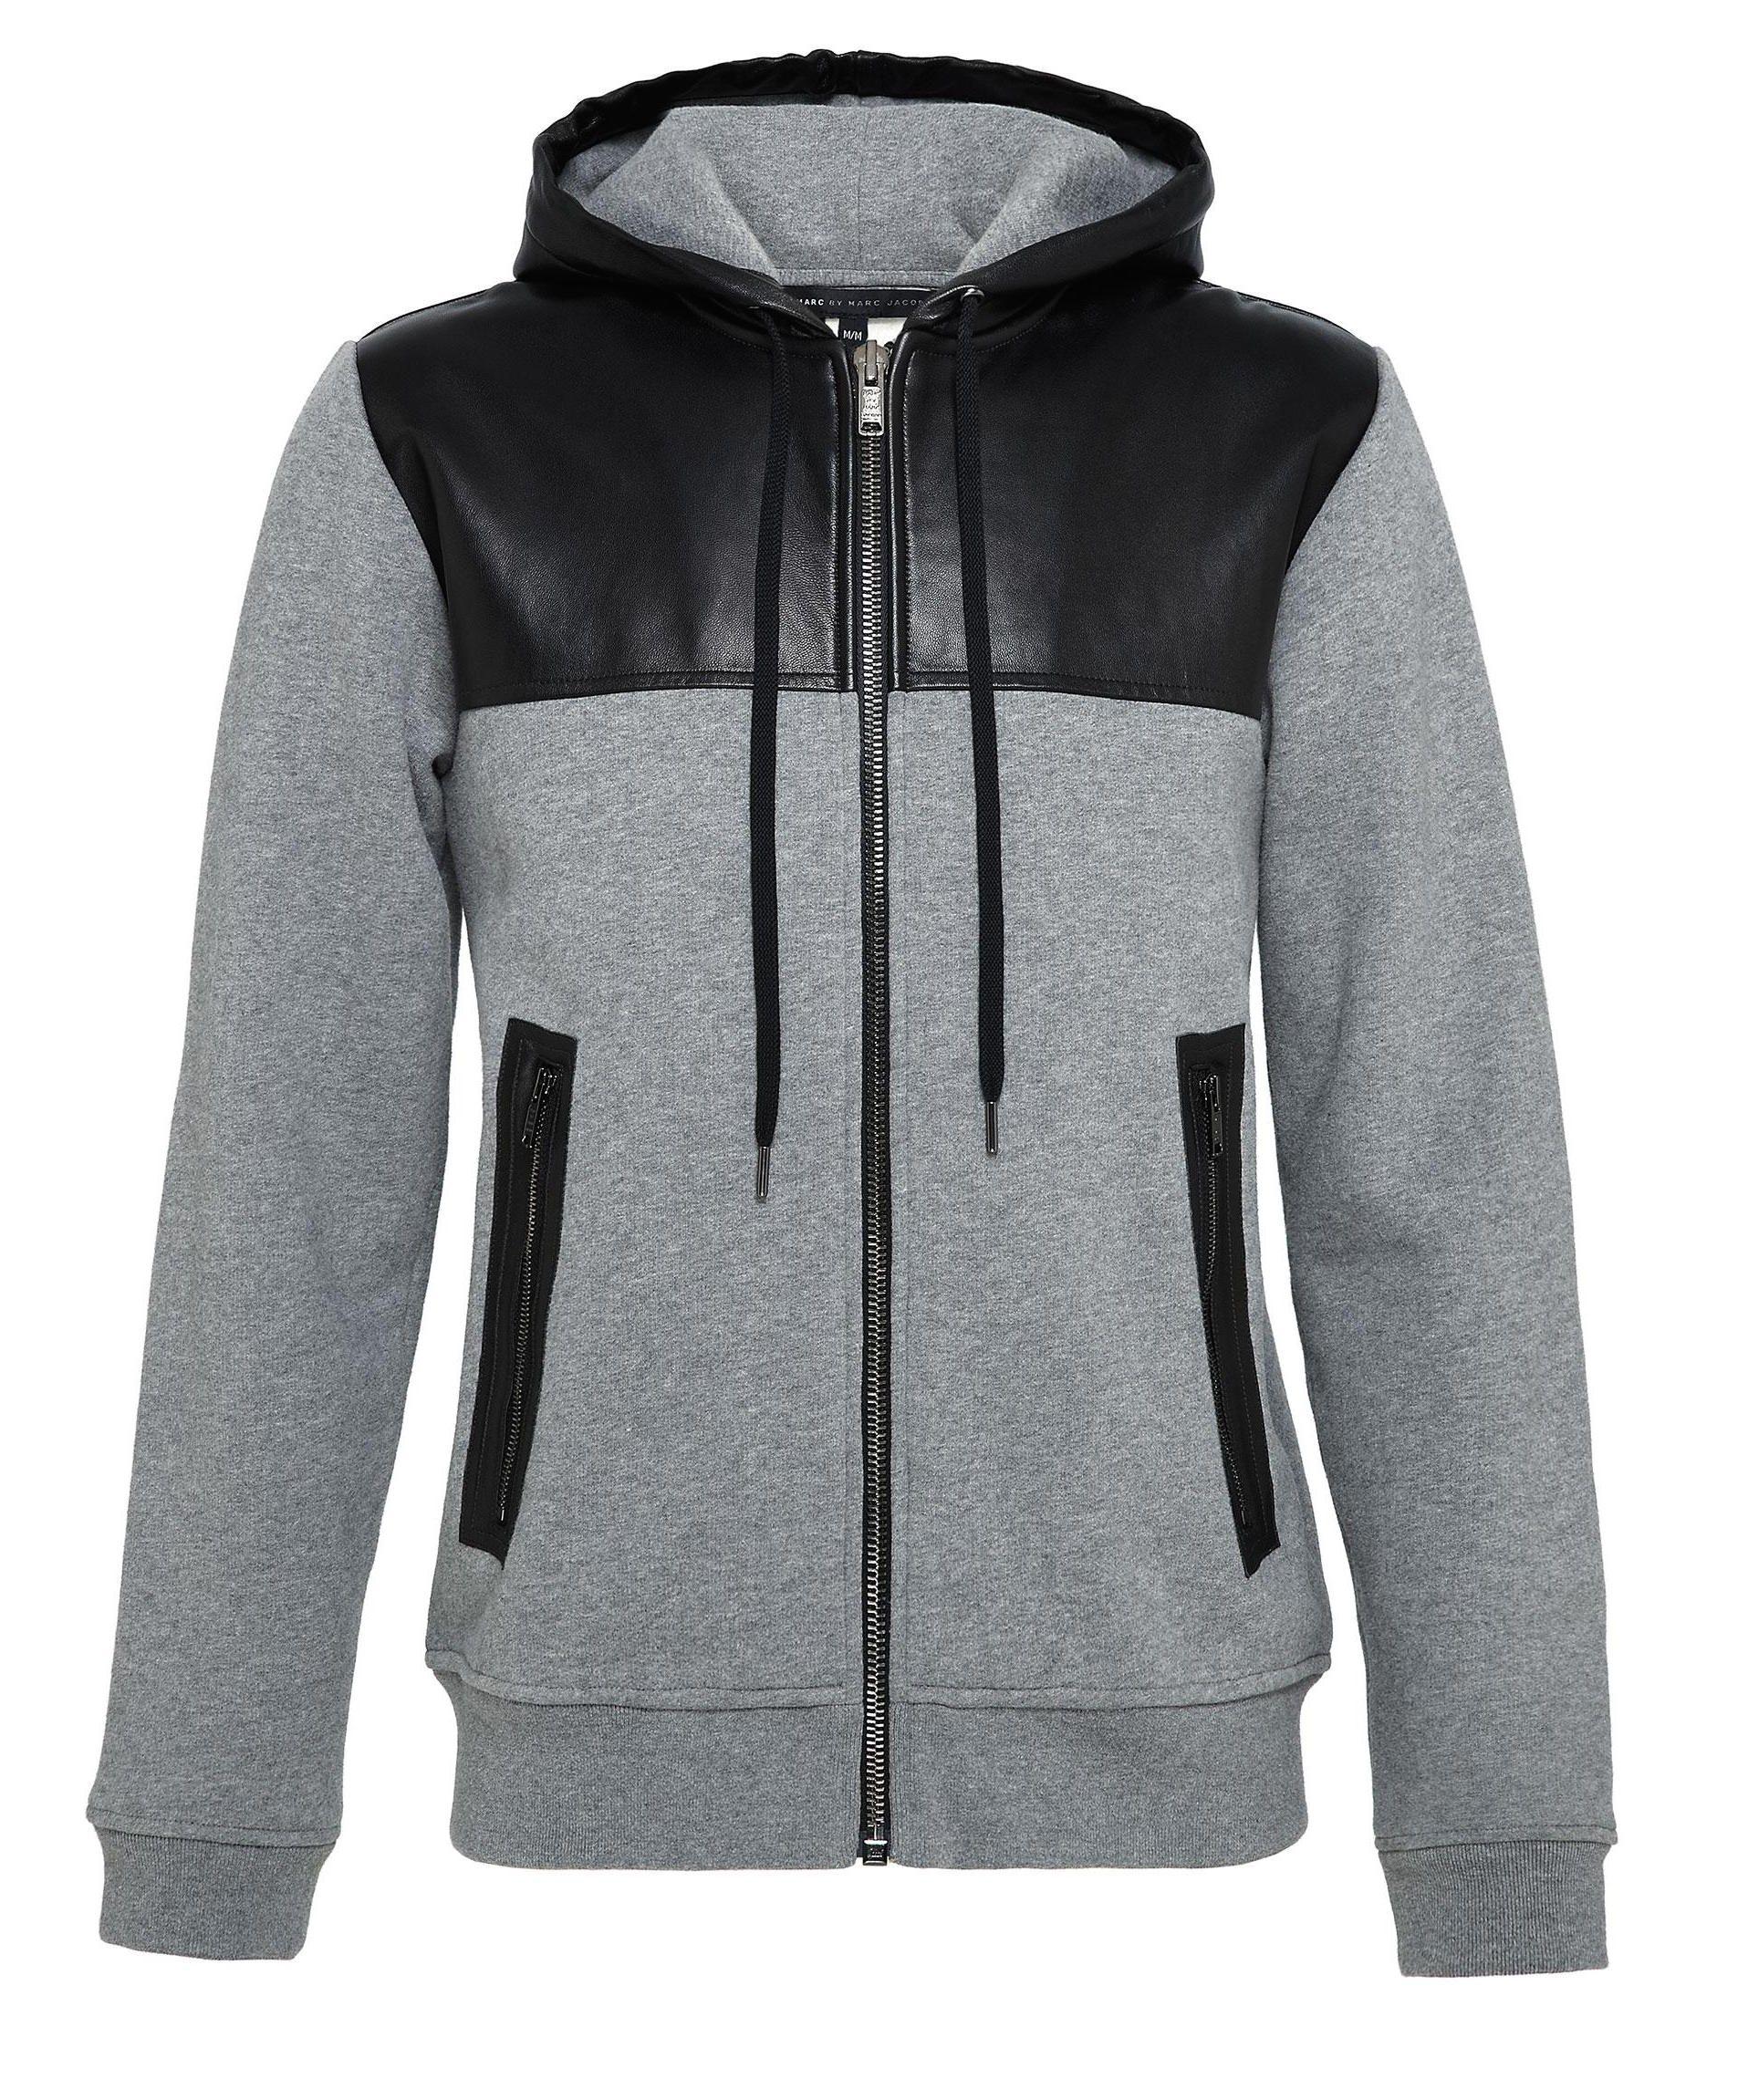 Marc Jacobs Sweatshirts Marc Jacobs Mens Fashion [ 2880 x 1920 Pixel ]